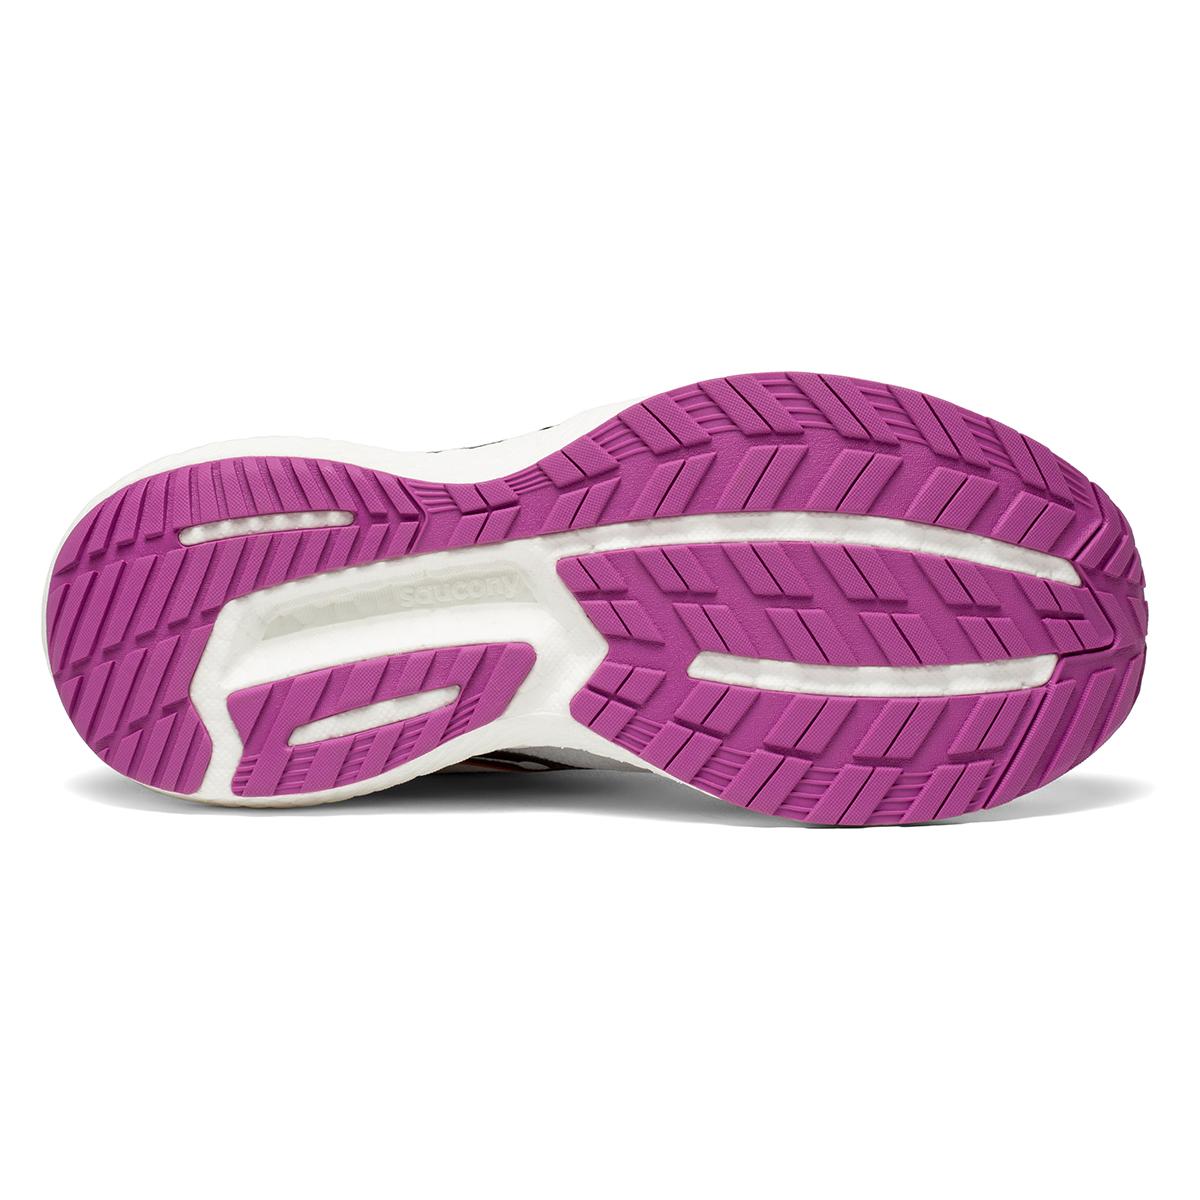 Women's Saucony Triumph 19 Running Shoe, , large, image 5